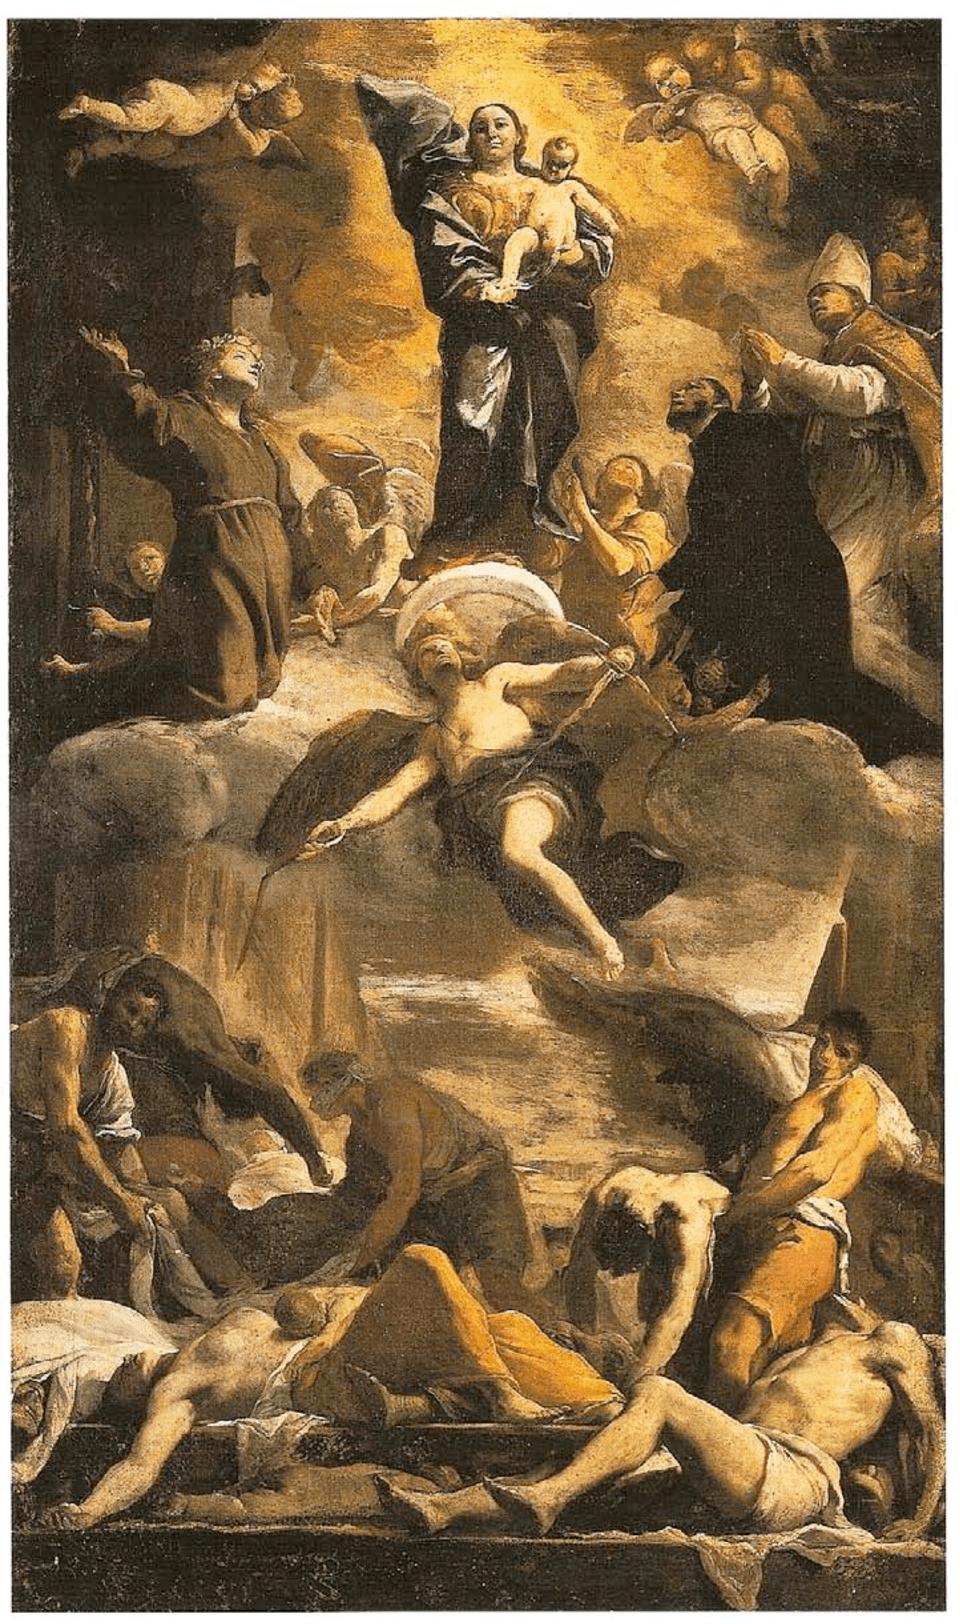 Mattia Preti, The Immaculate Conception with Saints, 1657.